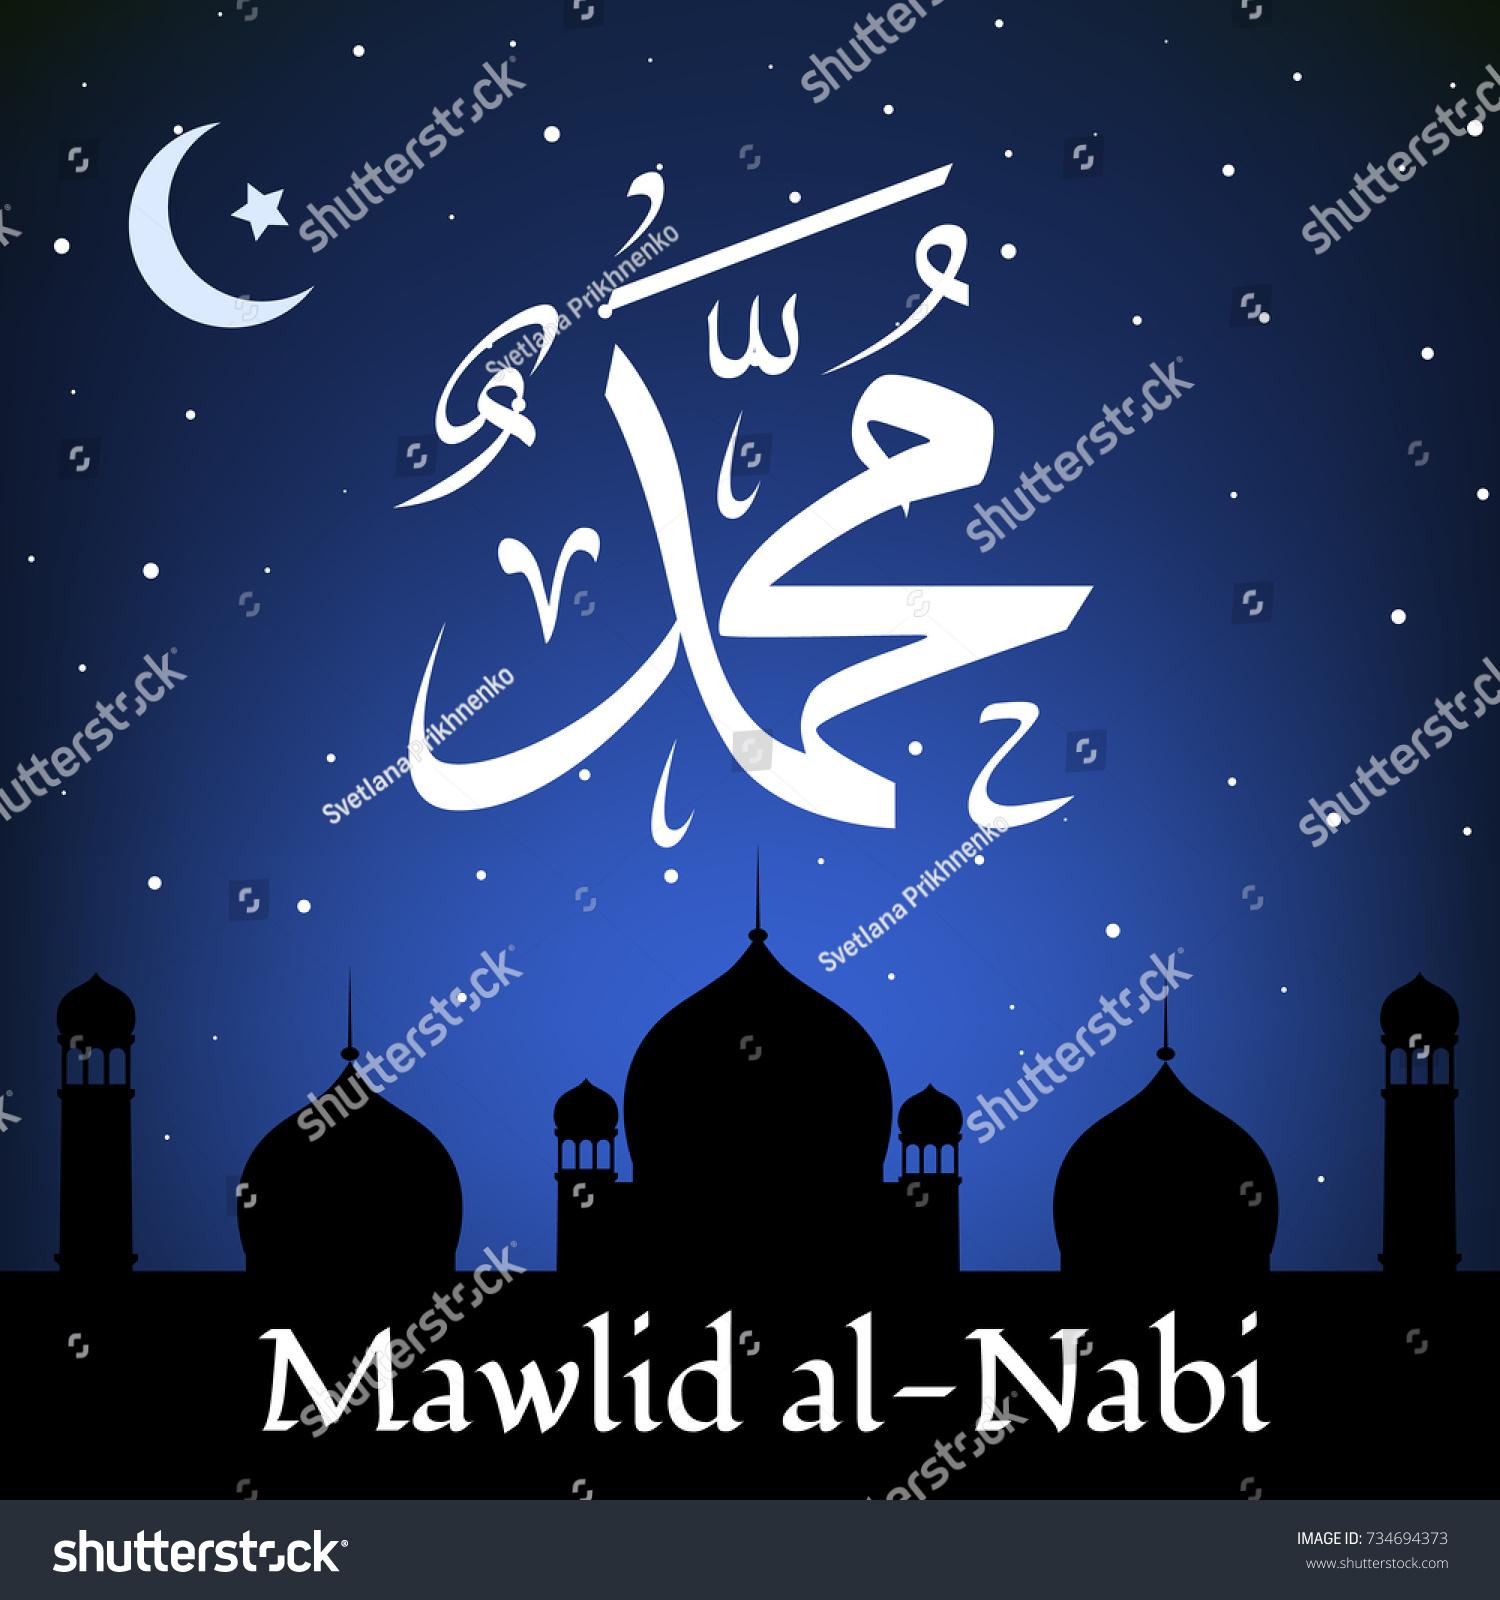 Royalty Free Stock Illustration Of Mawlid Al Nabi Translation